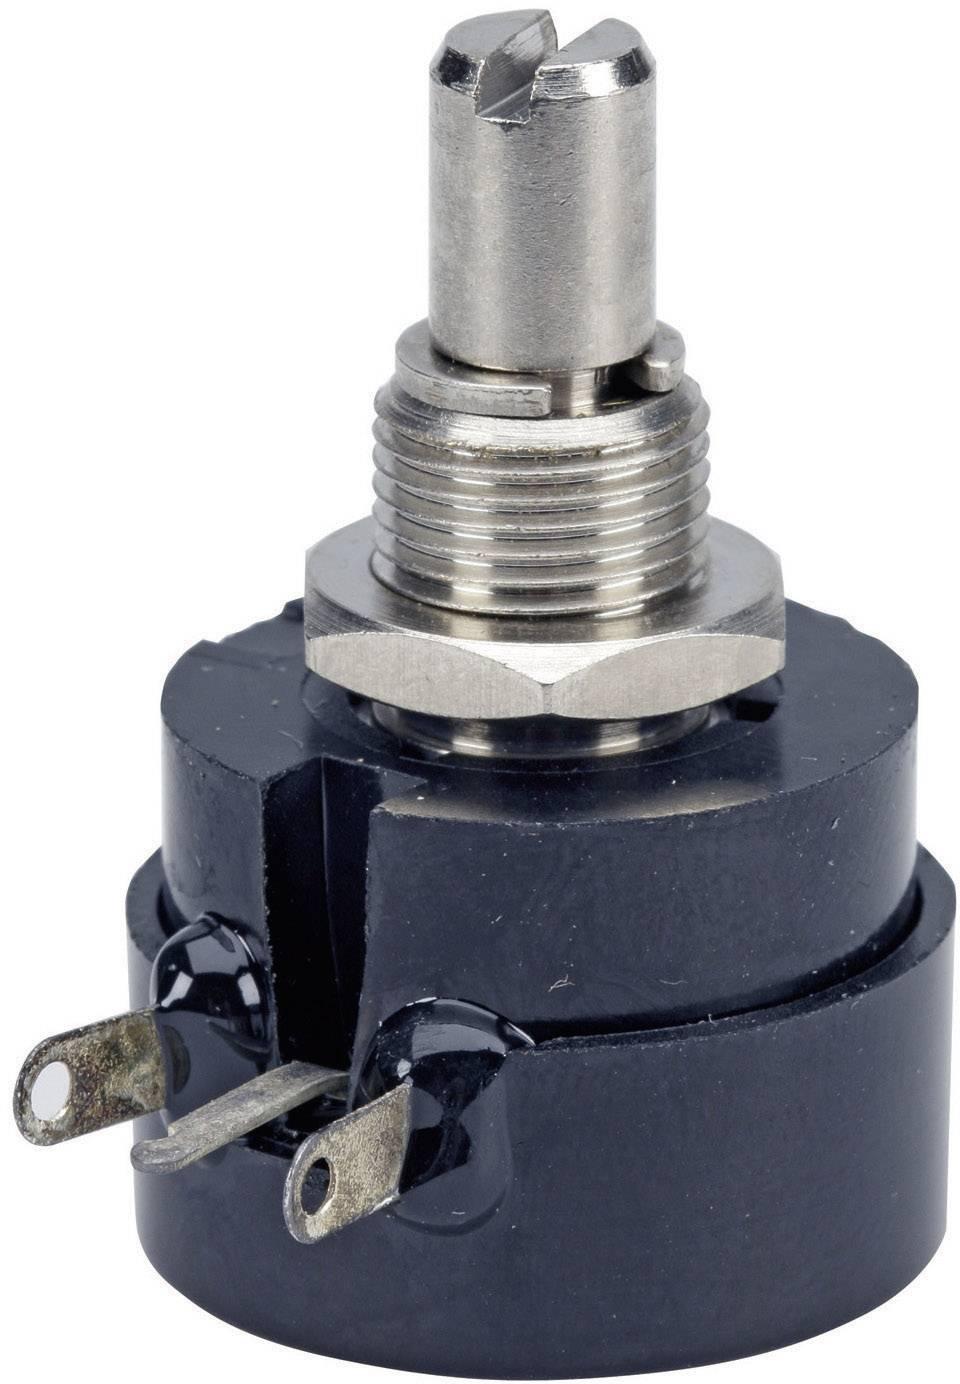 Drôtový potenciometer mono TT Electronics AB 3101106111 3101106111, 0.5 W, 100 Ohm, 1 ks